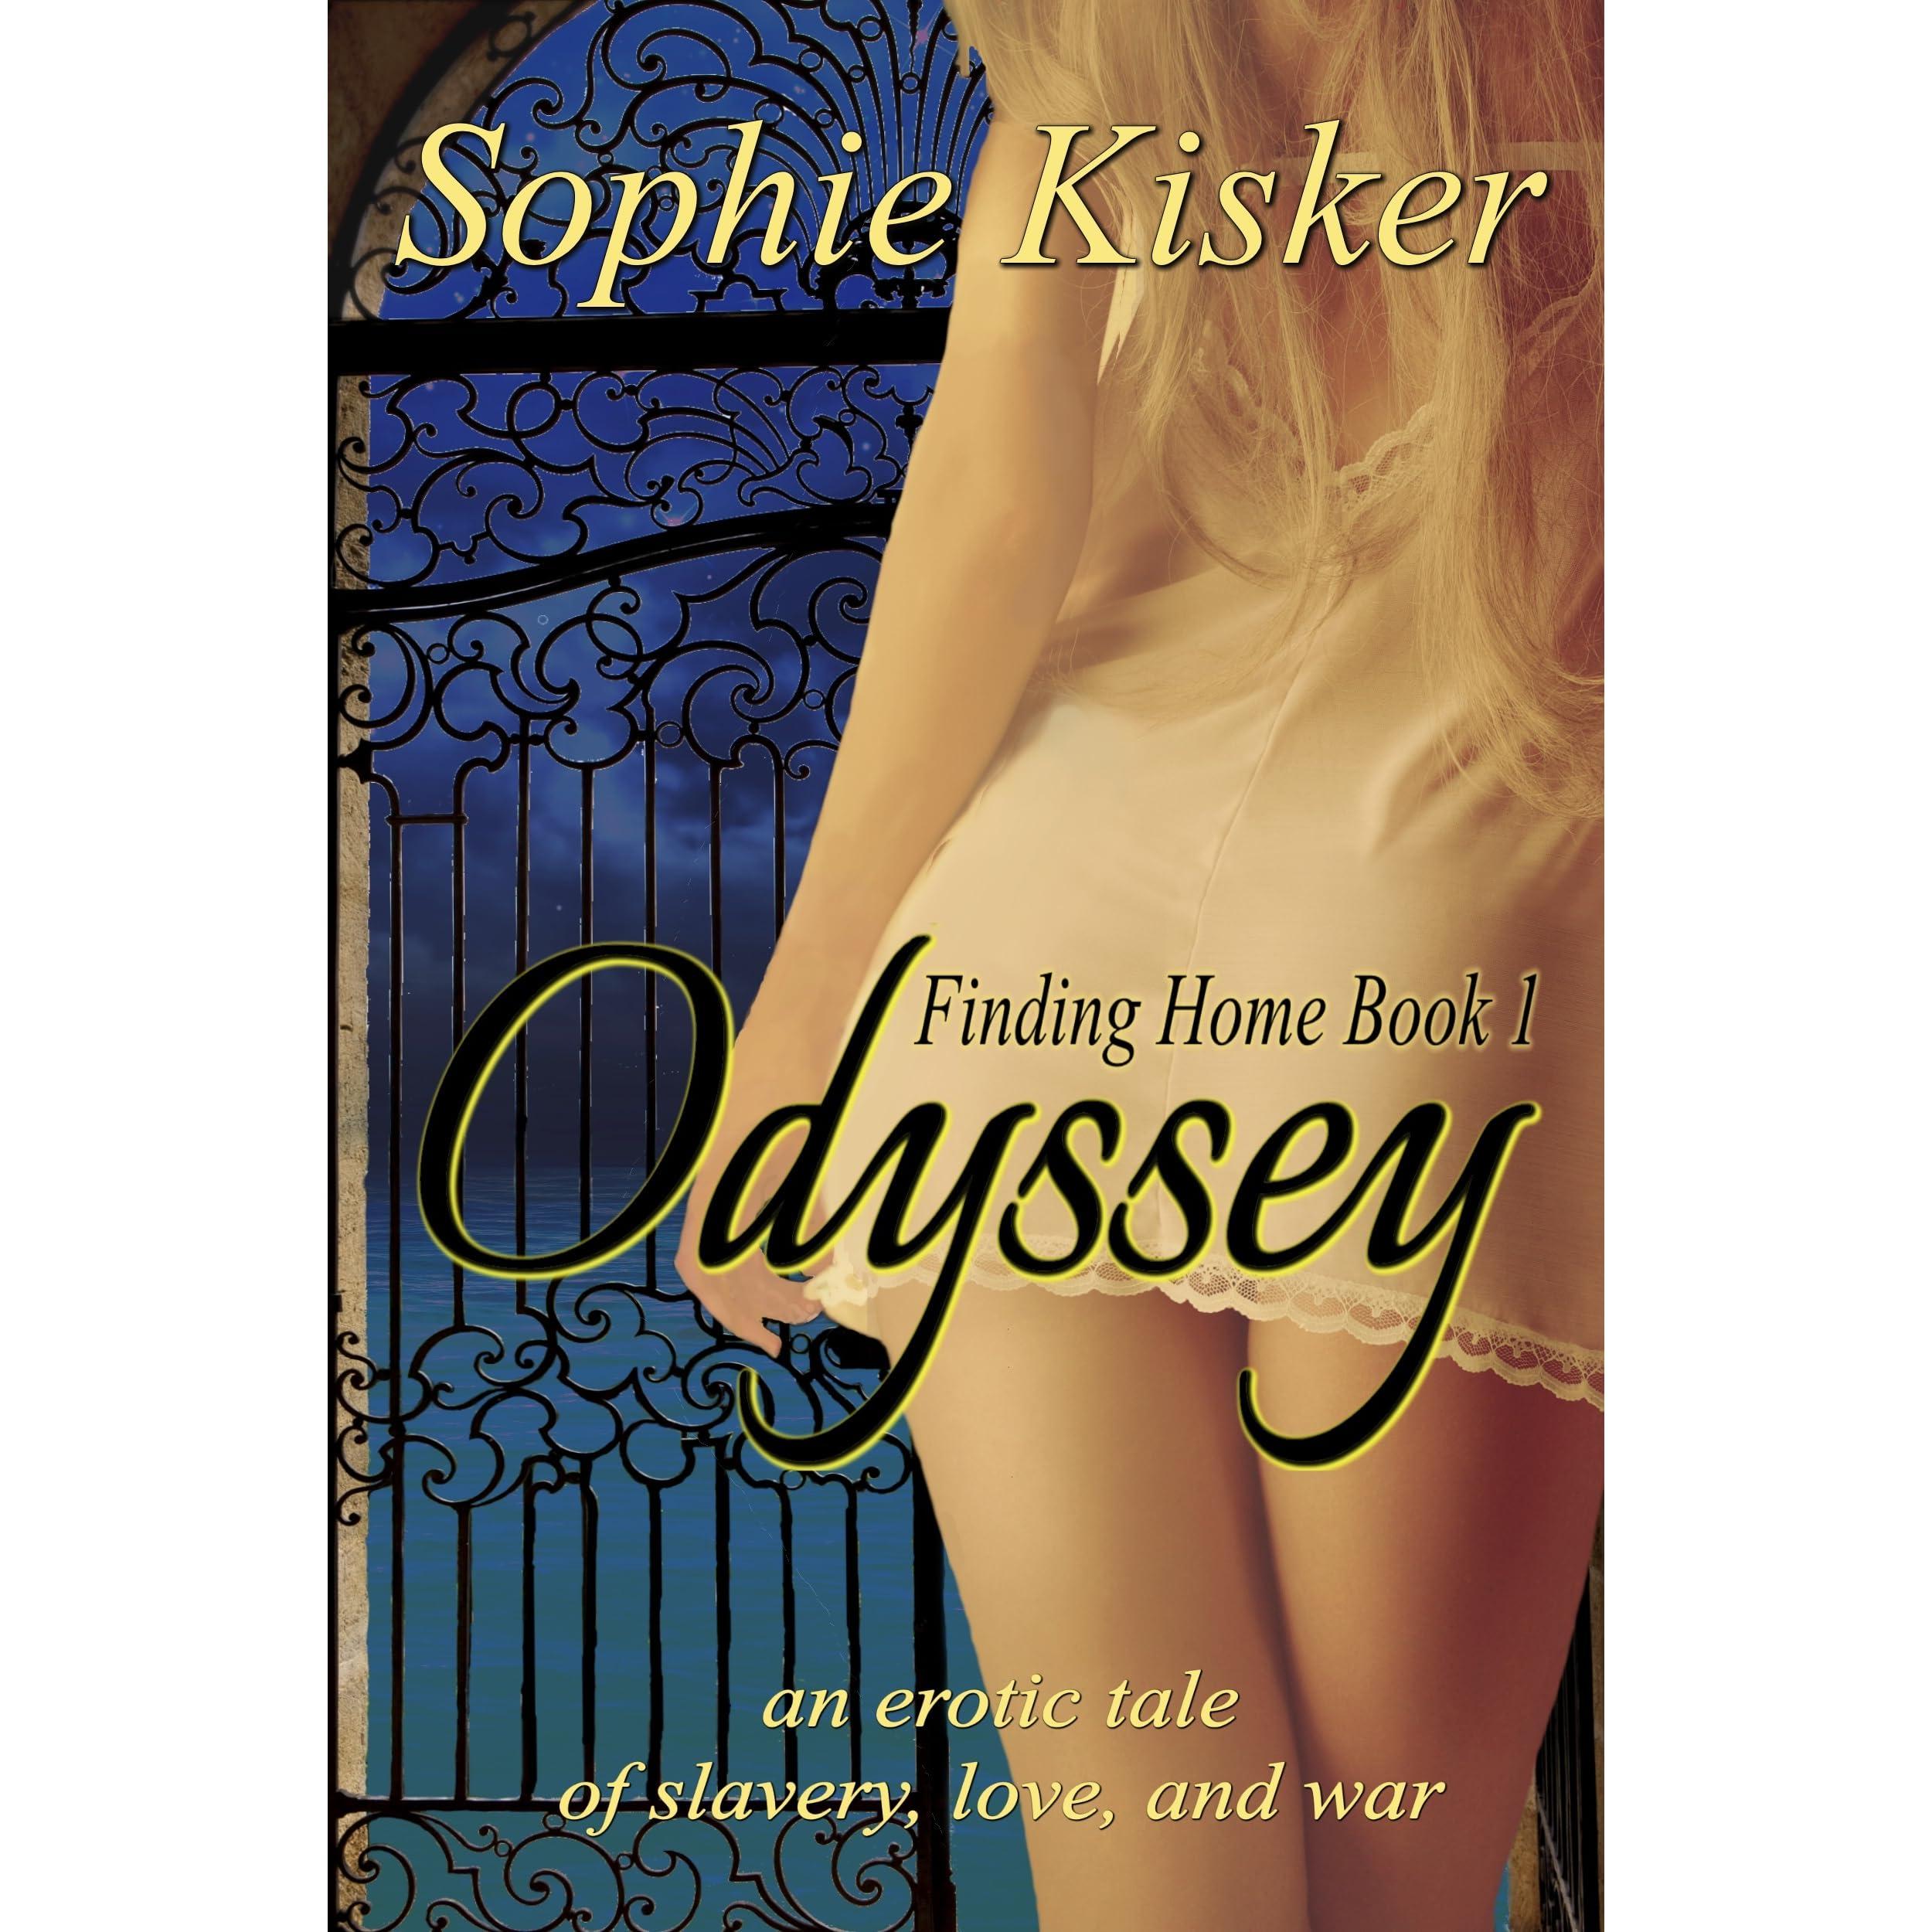 Lost odessy erotica